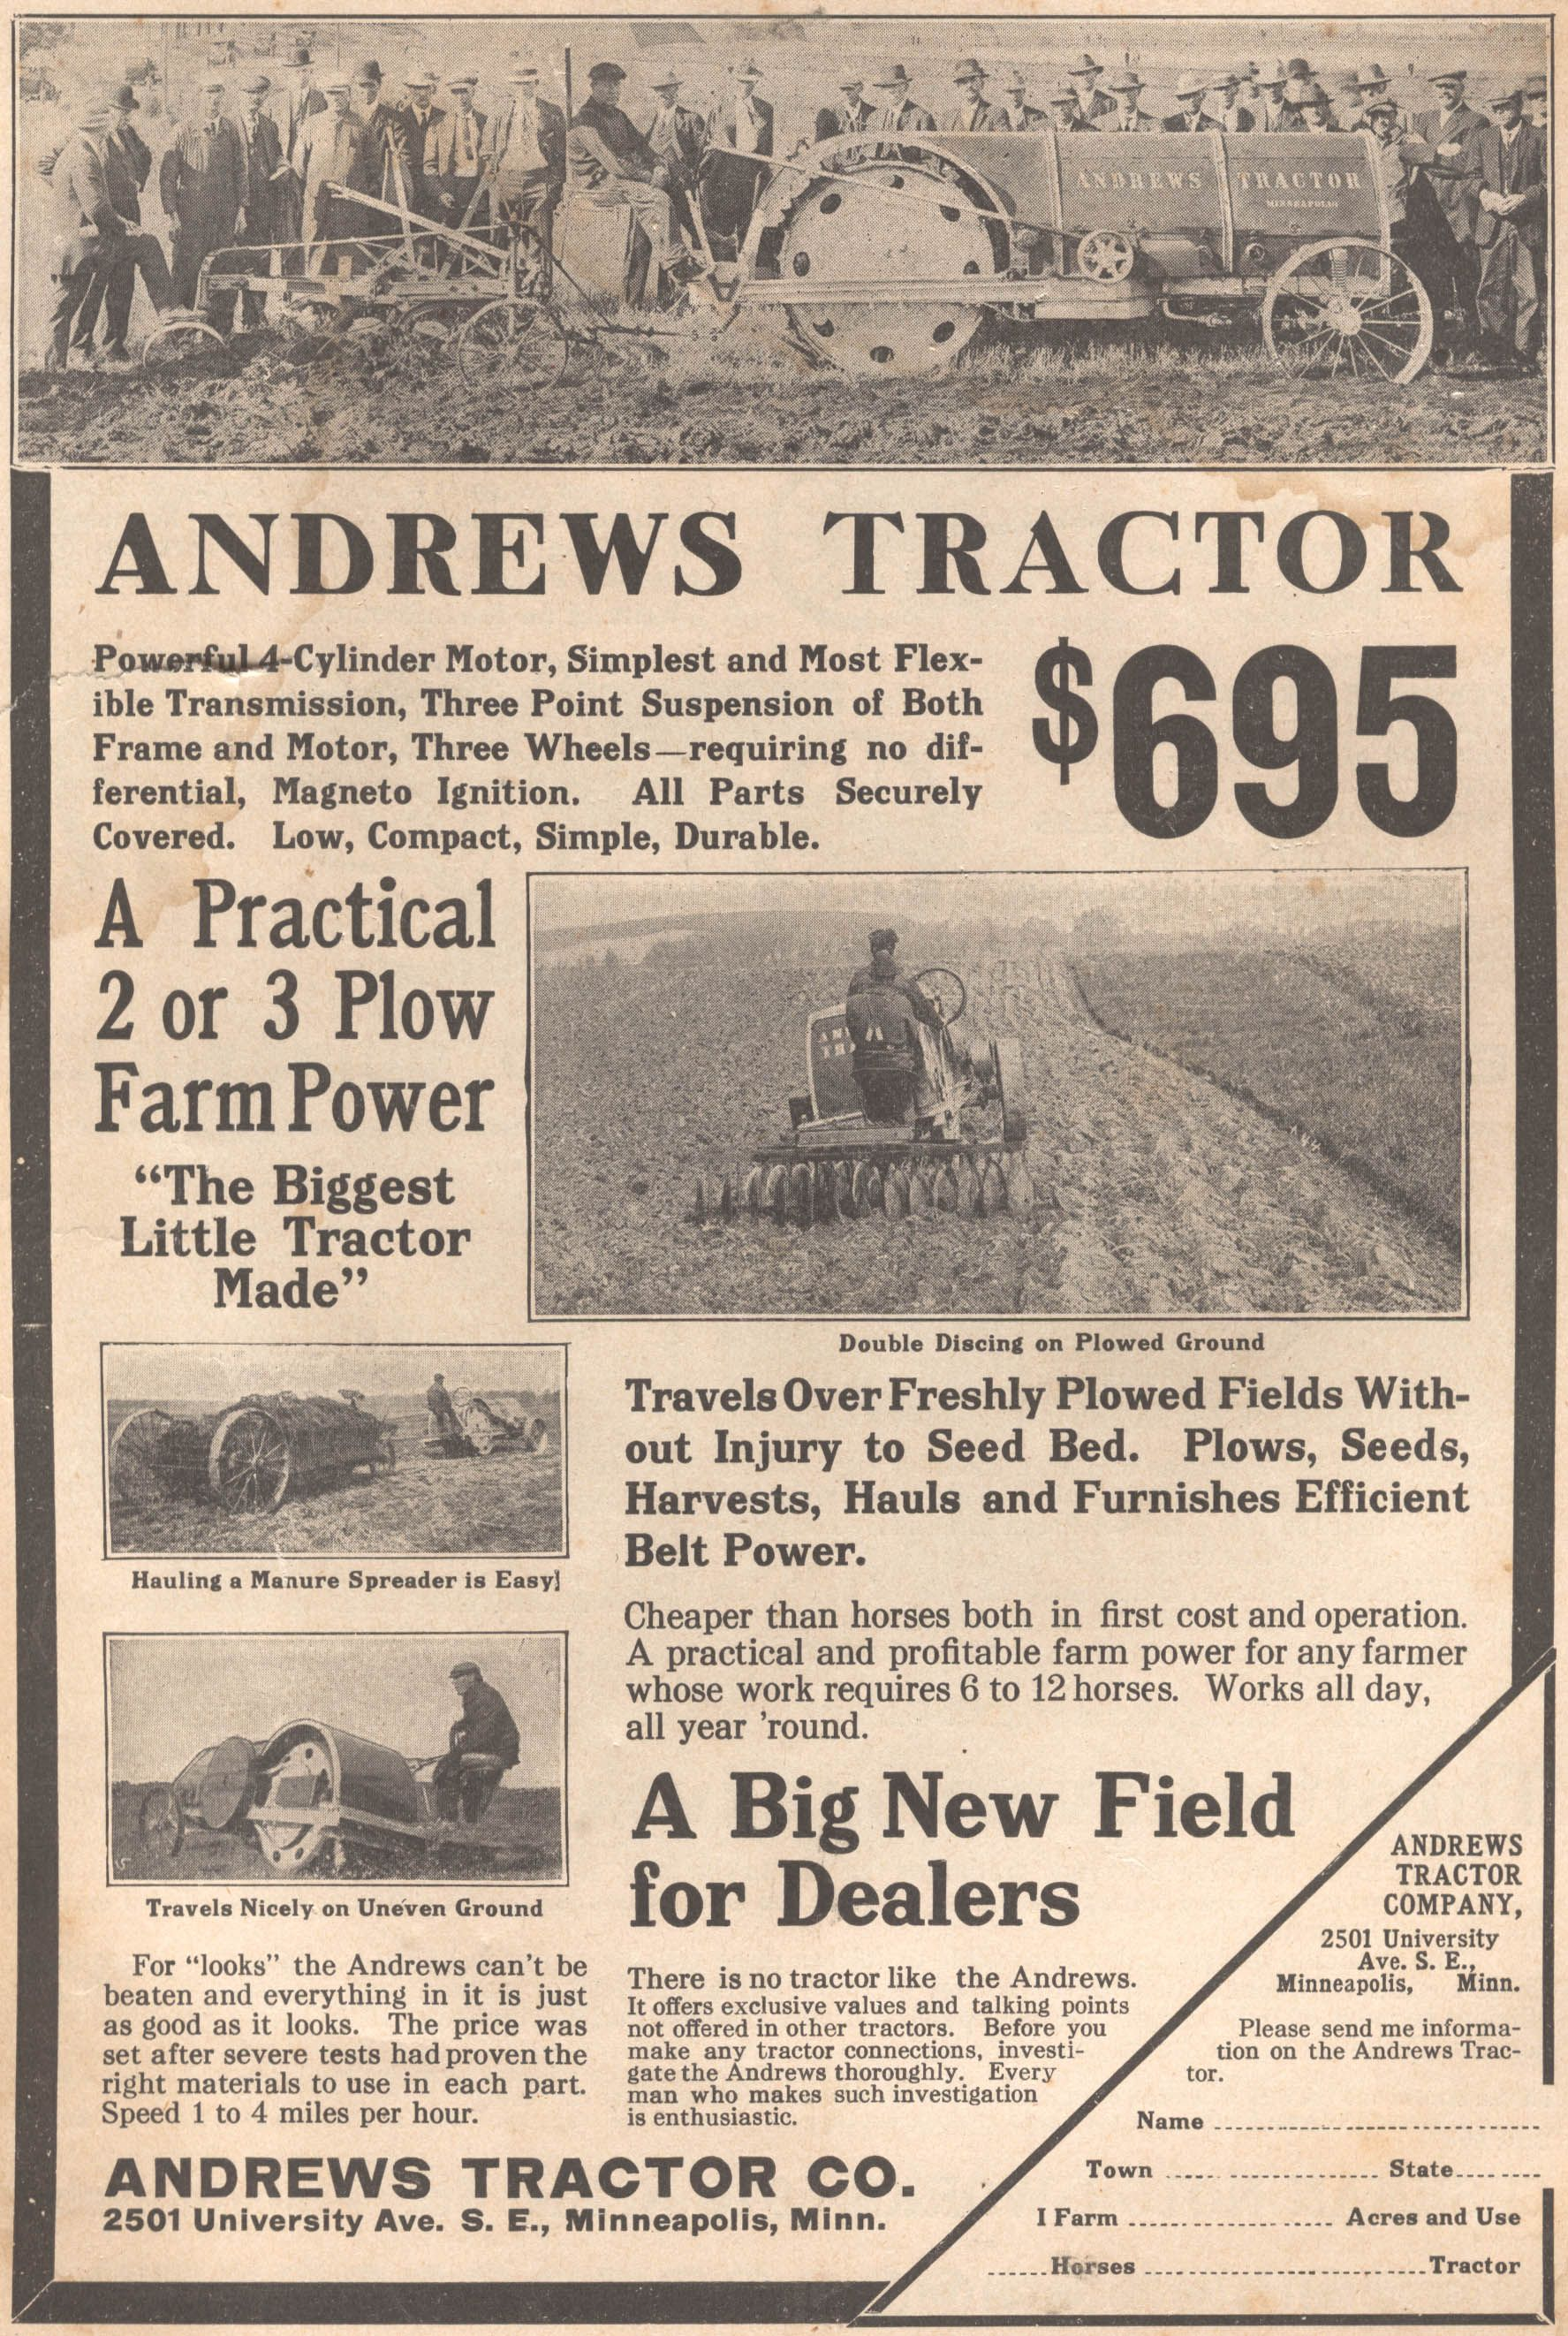 Andrews Tractor 1915 | Tractor & Farm Equipment Advertising